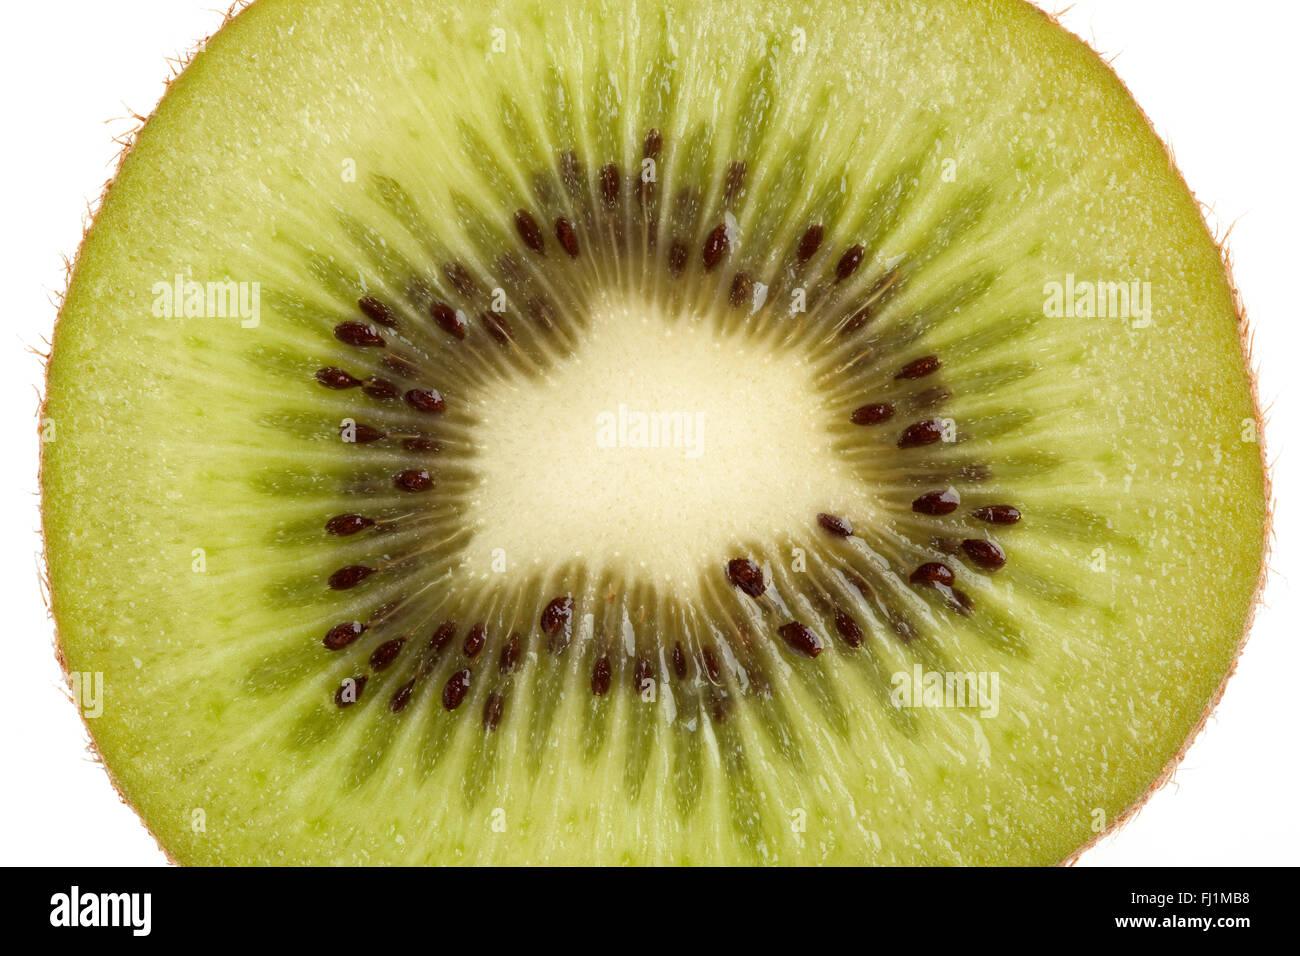 Frische Scheibe Kiwifrucht hautnah Stockbild